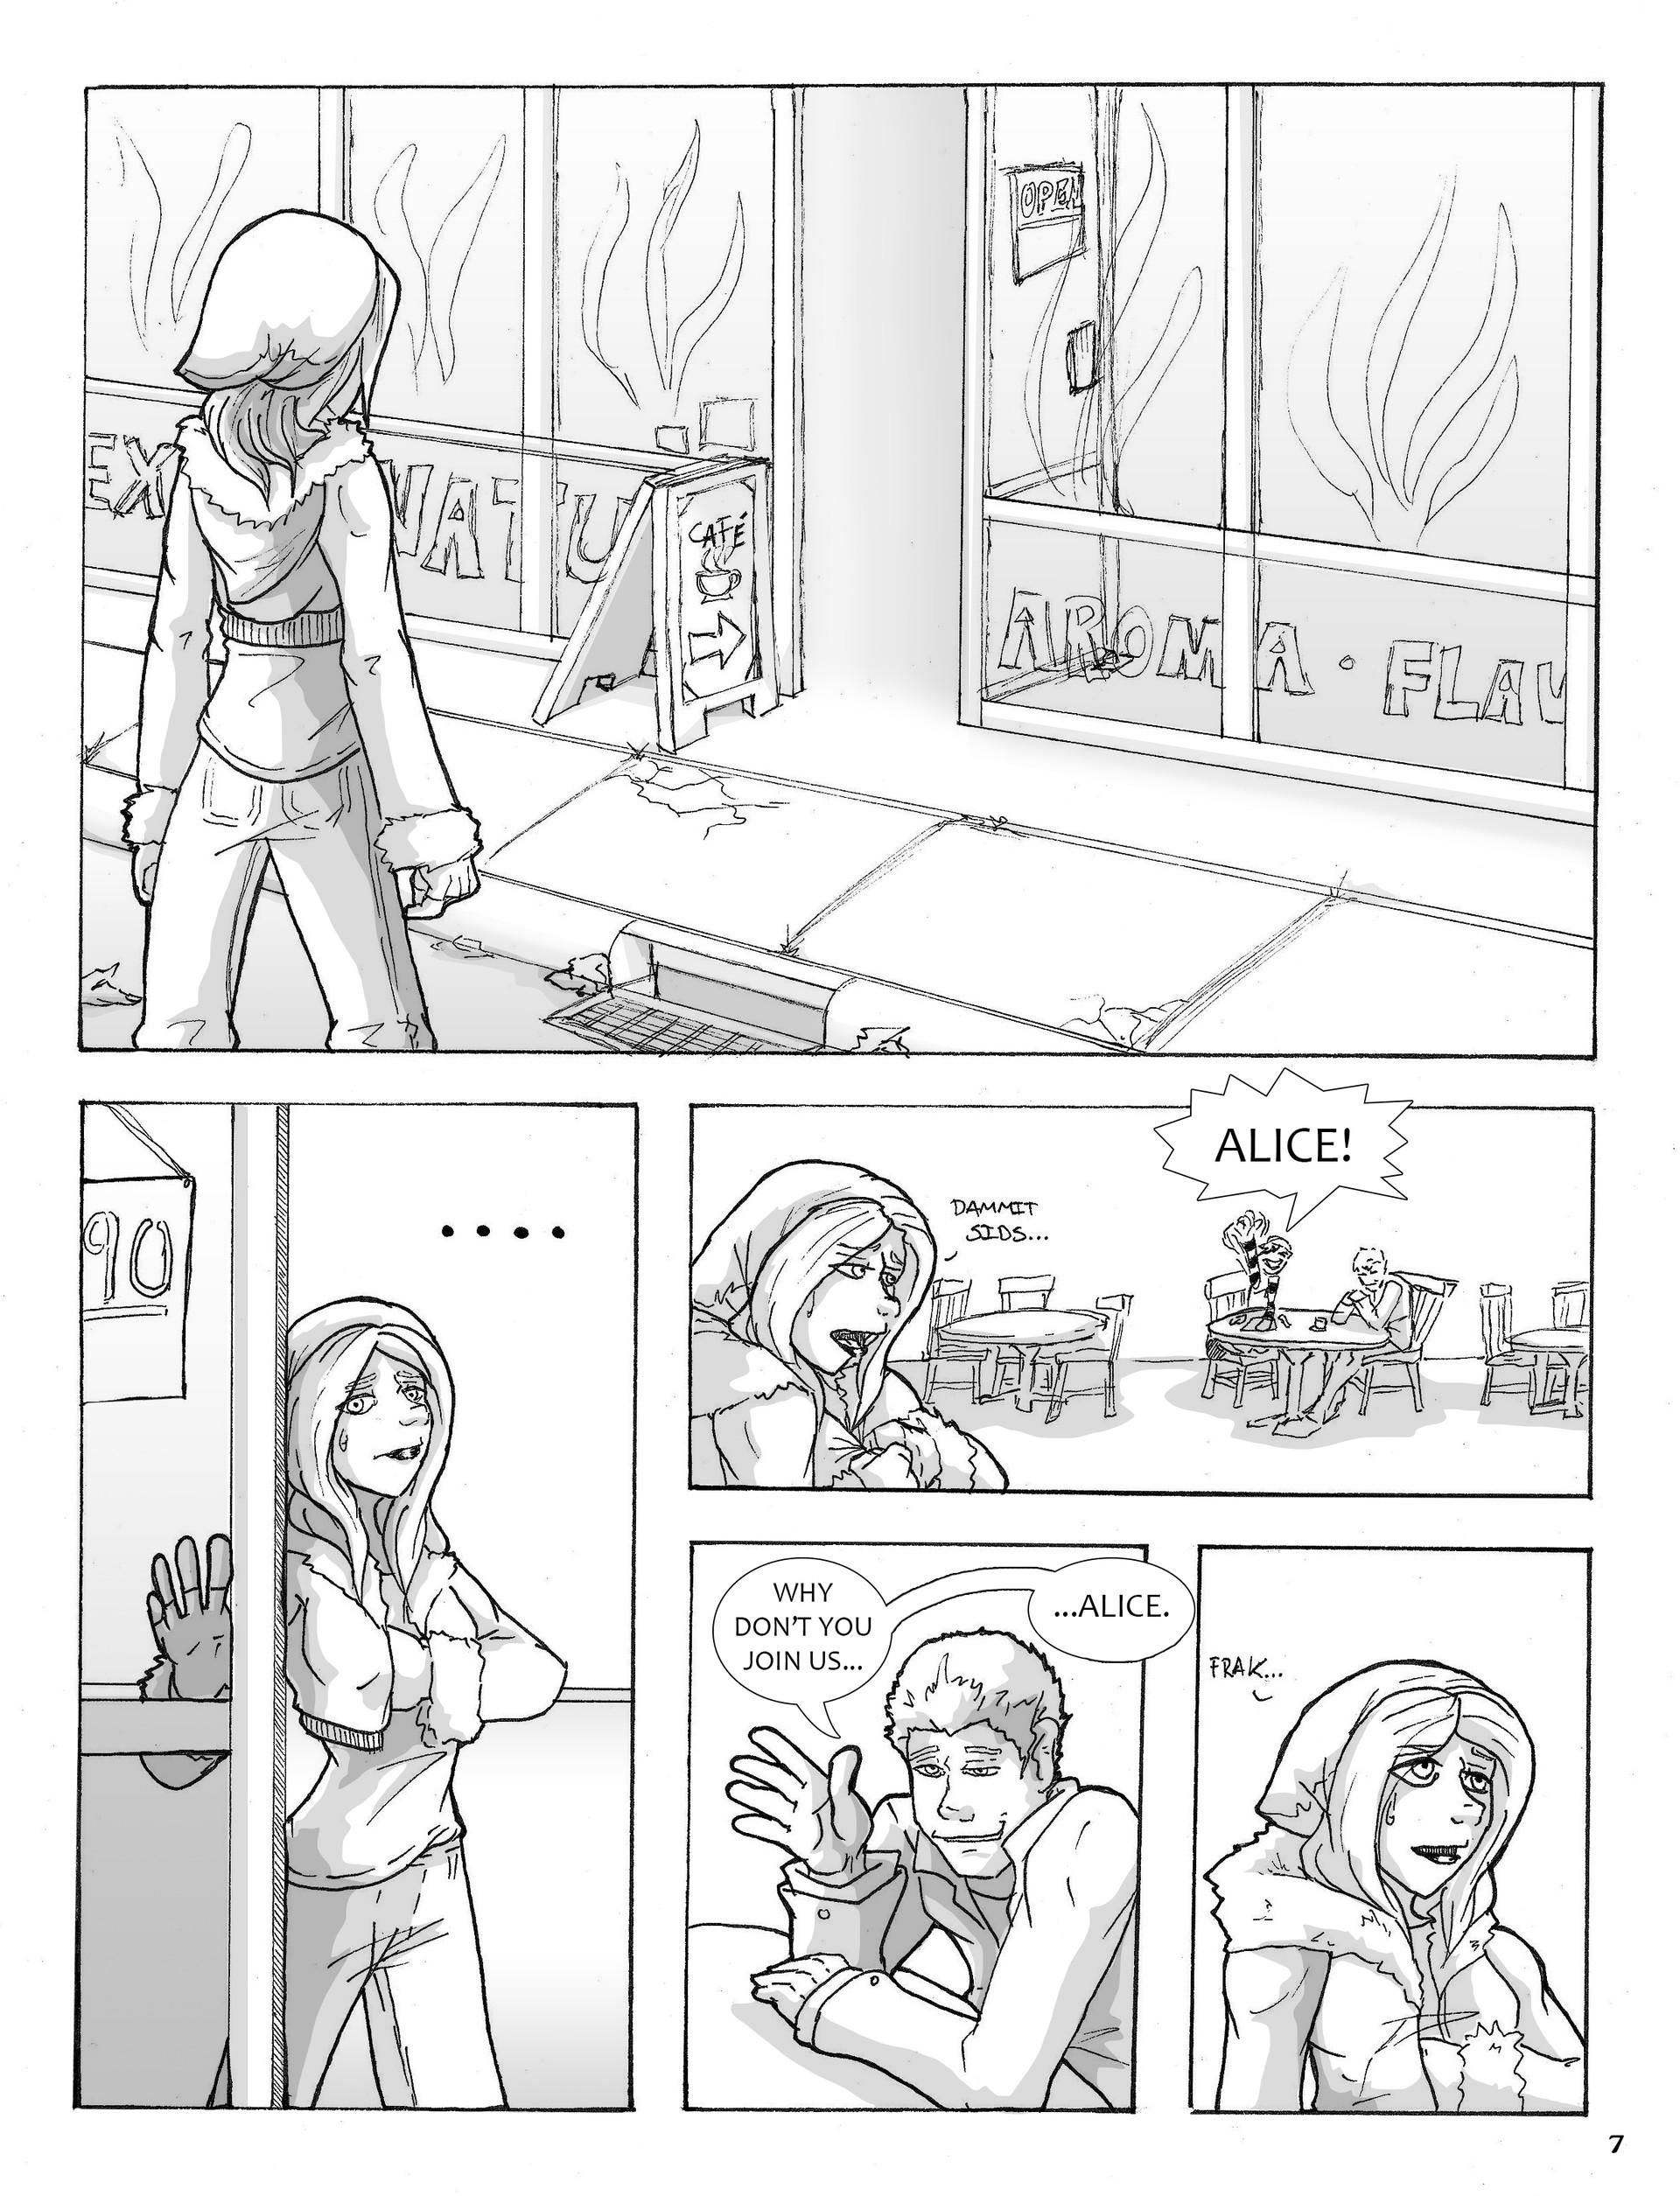 Detonya kan page7